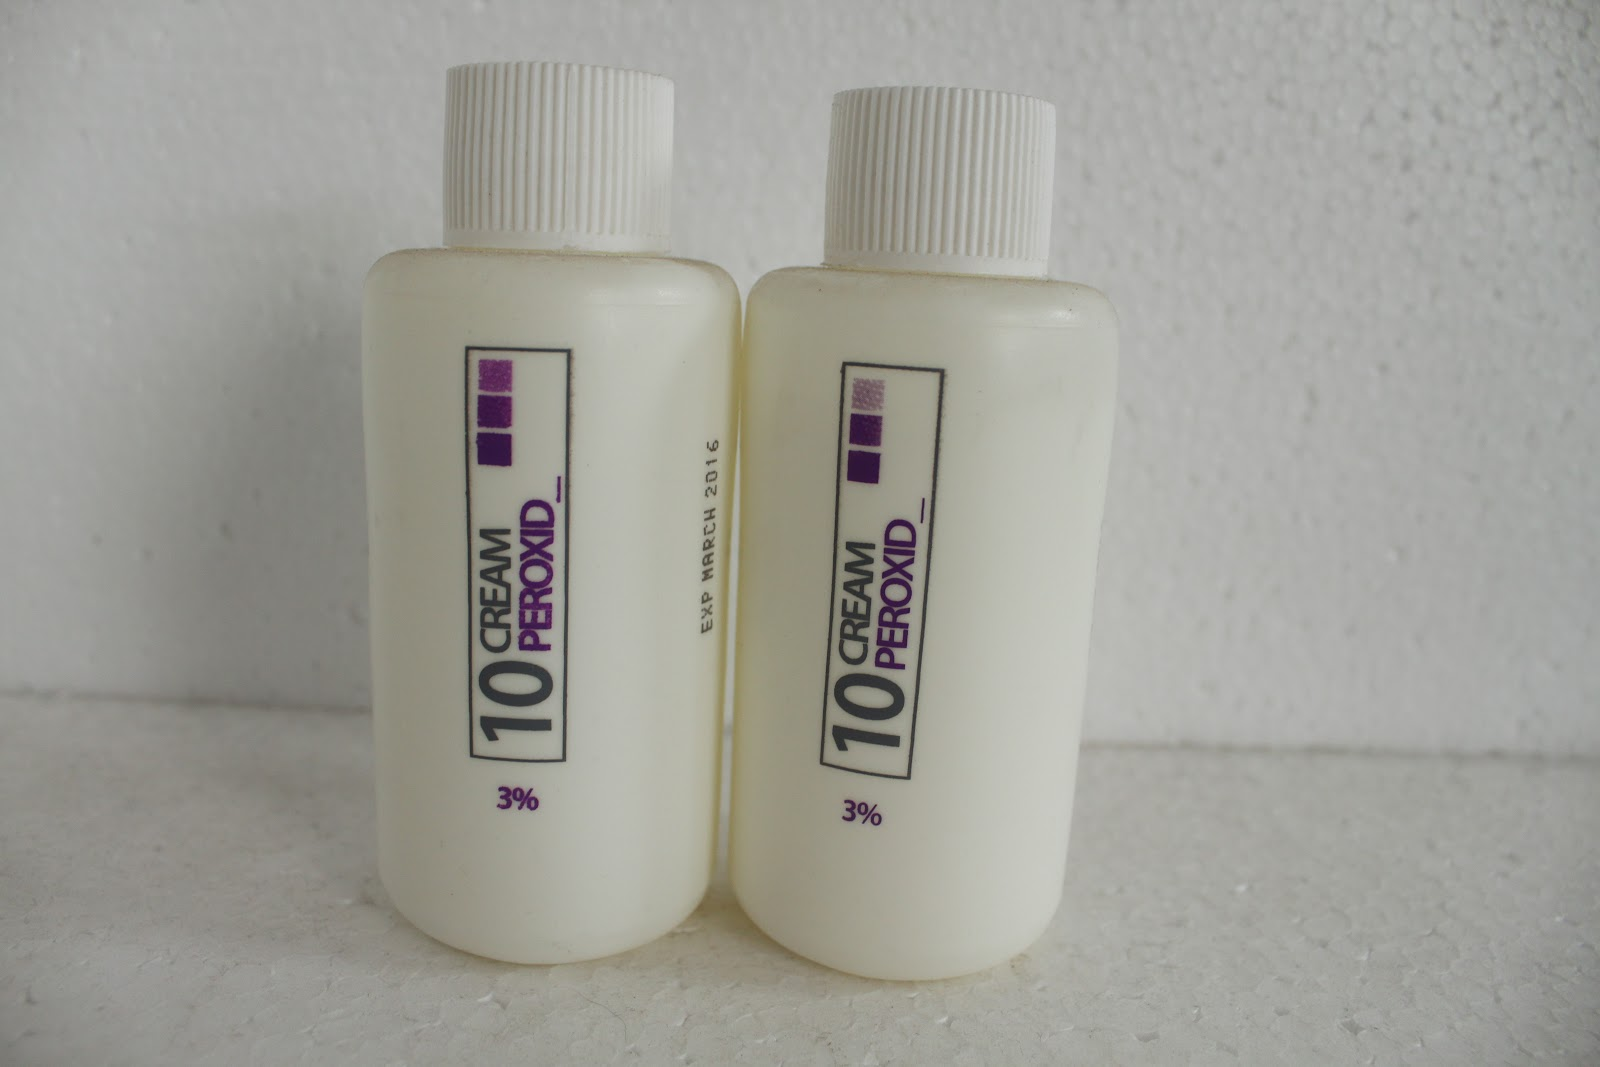 My Salonnn Hair Care And Treatment Everline Structura Mask 1000 Ml Pemesanan Dan Konsultasi